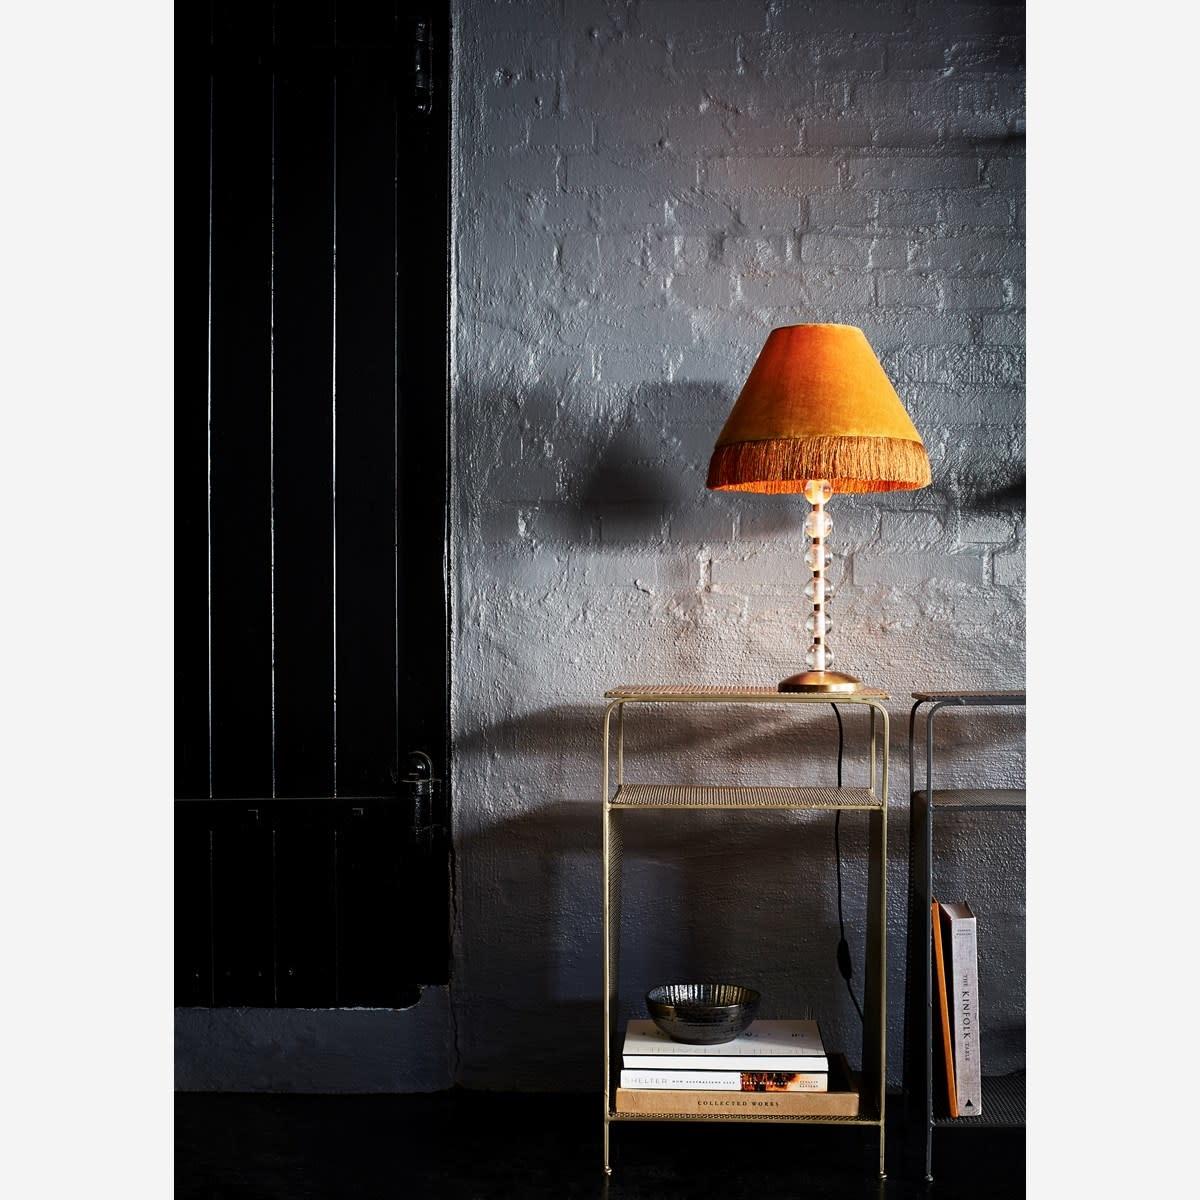 Kast Standing iron shelf 41x30x70cm Gold-2